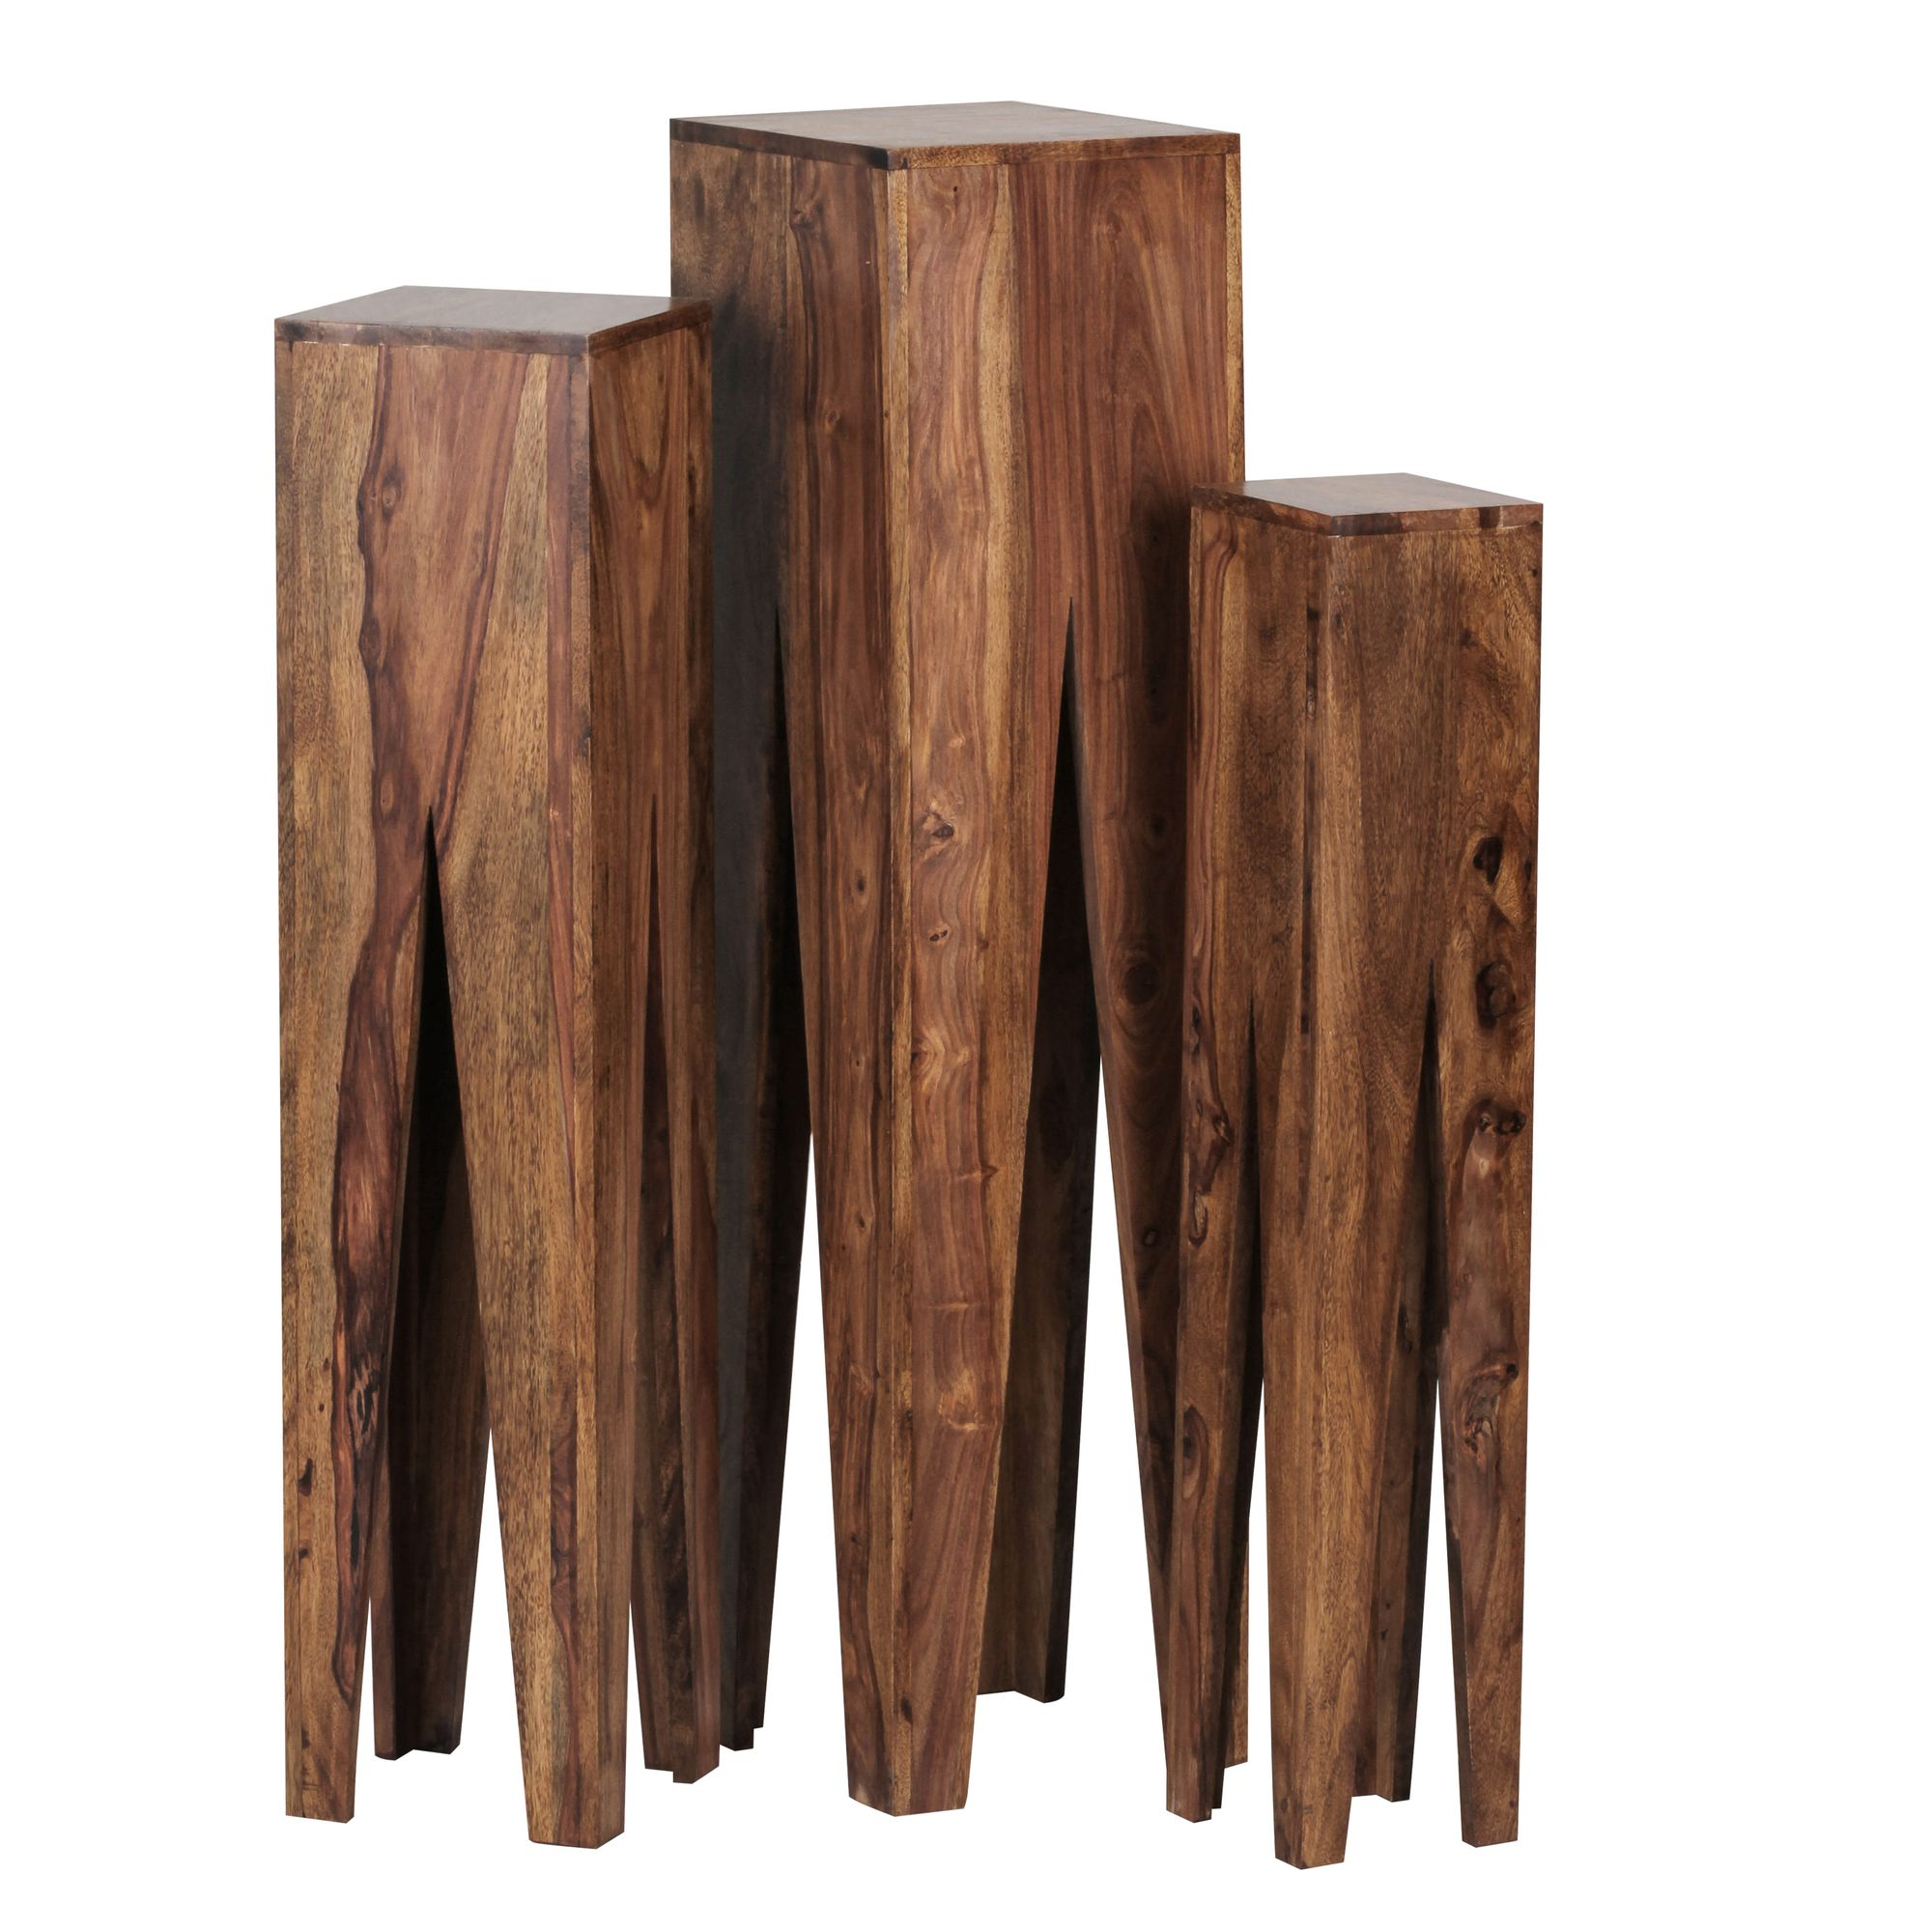 Odkládací stolky Kada, 100 cm, sada 3 ks, masiv Sheesham